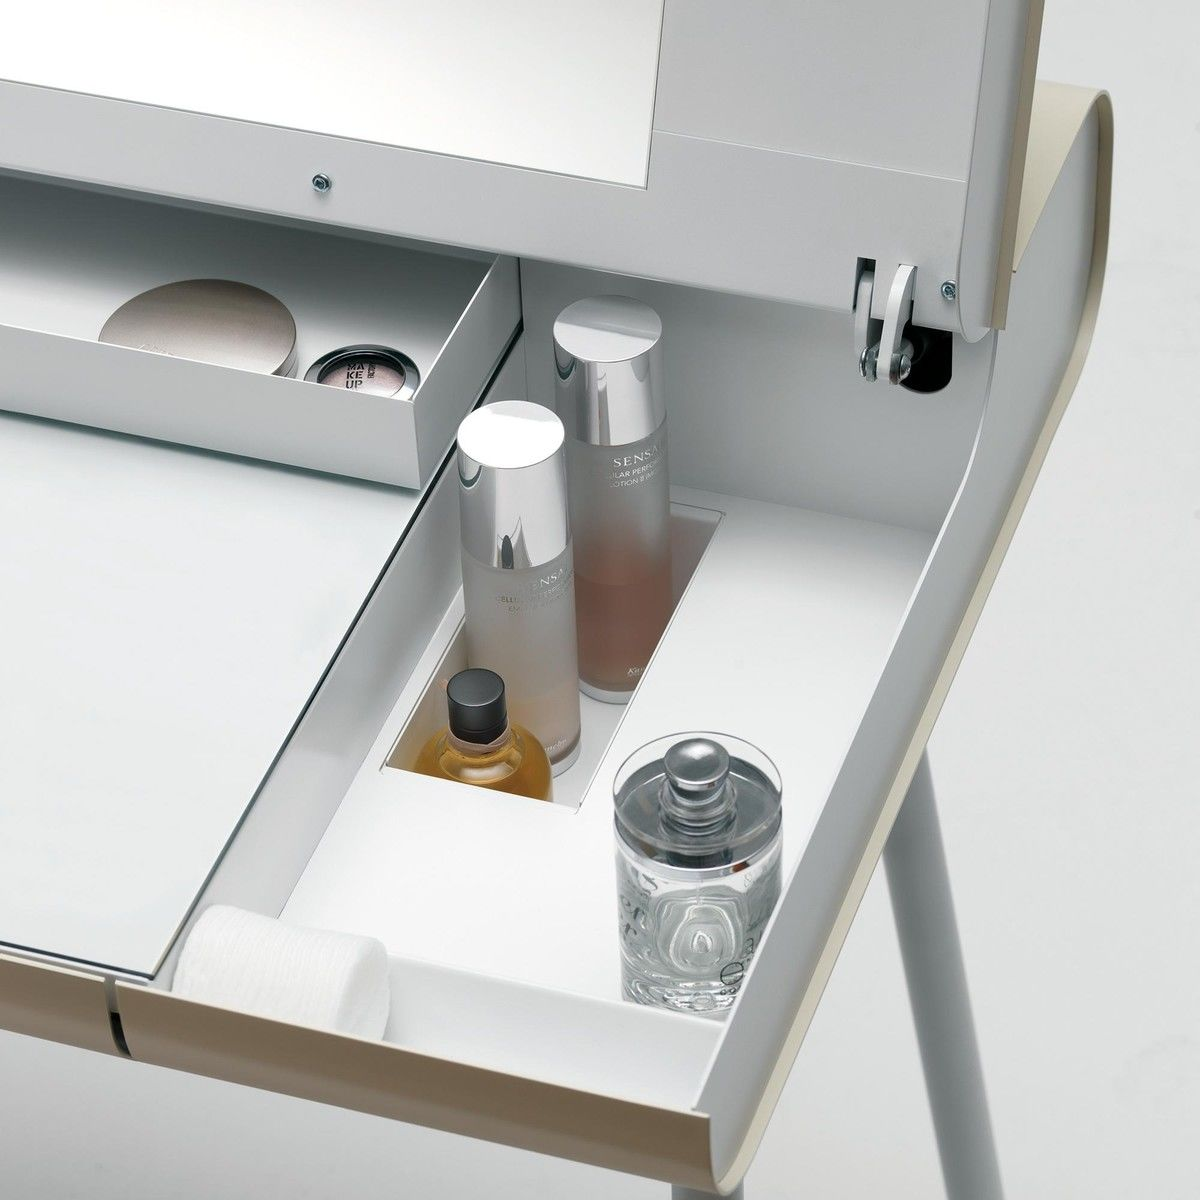 st08 schminktisch aufklappbar m ller m belfabrikation. Black Bedroom Furniture Sets. Home Design Ideas